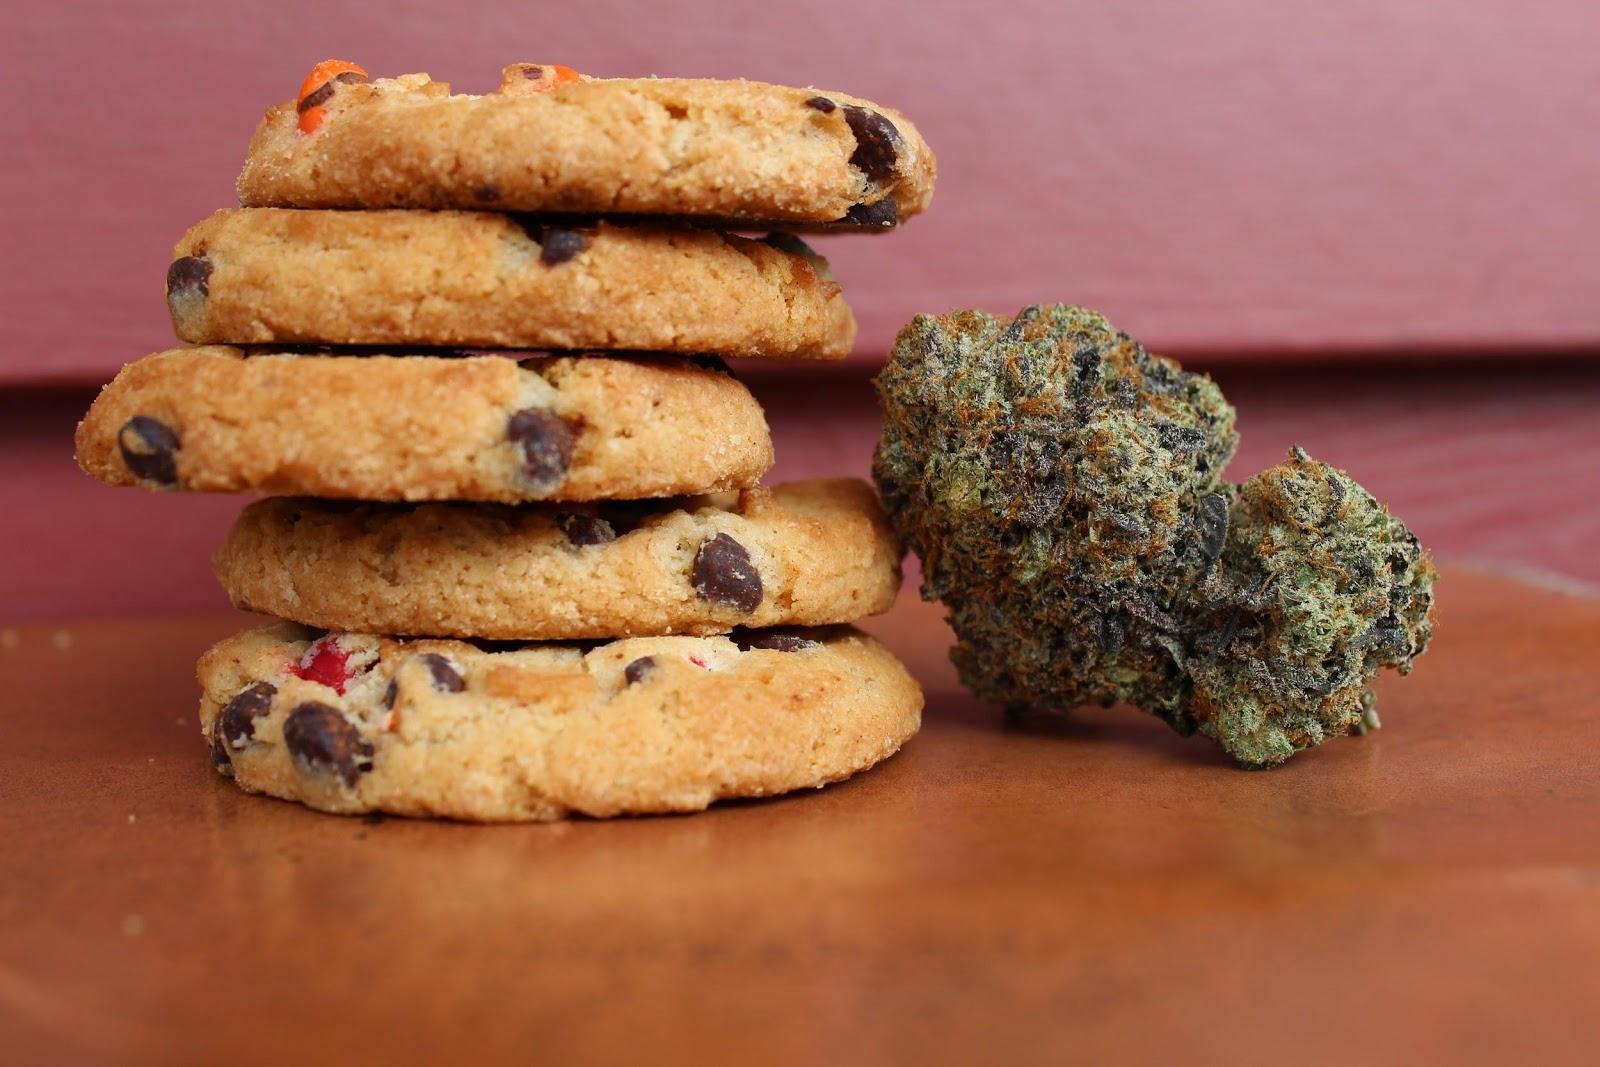 CBD oil, weed edibles like chocolates, cookies,